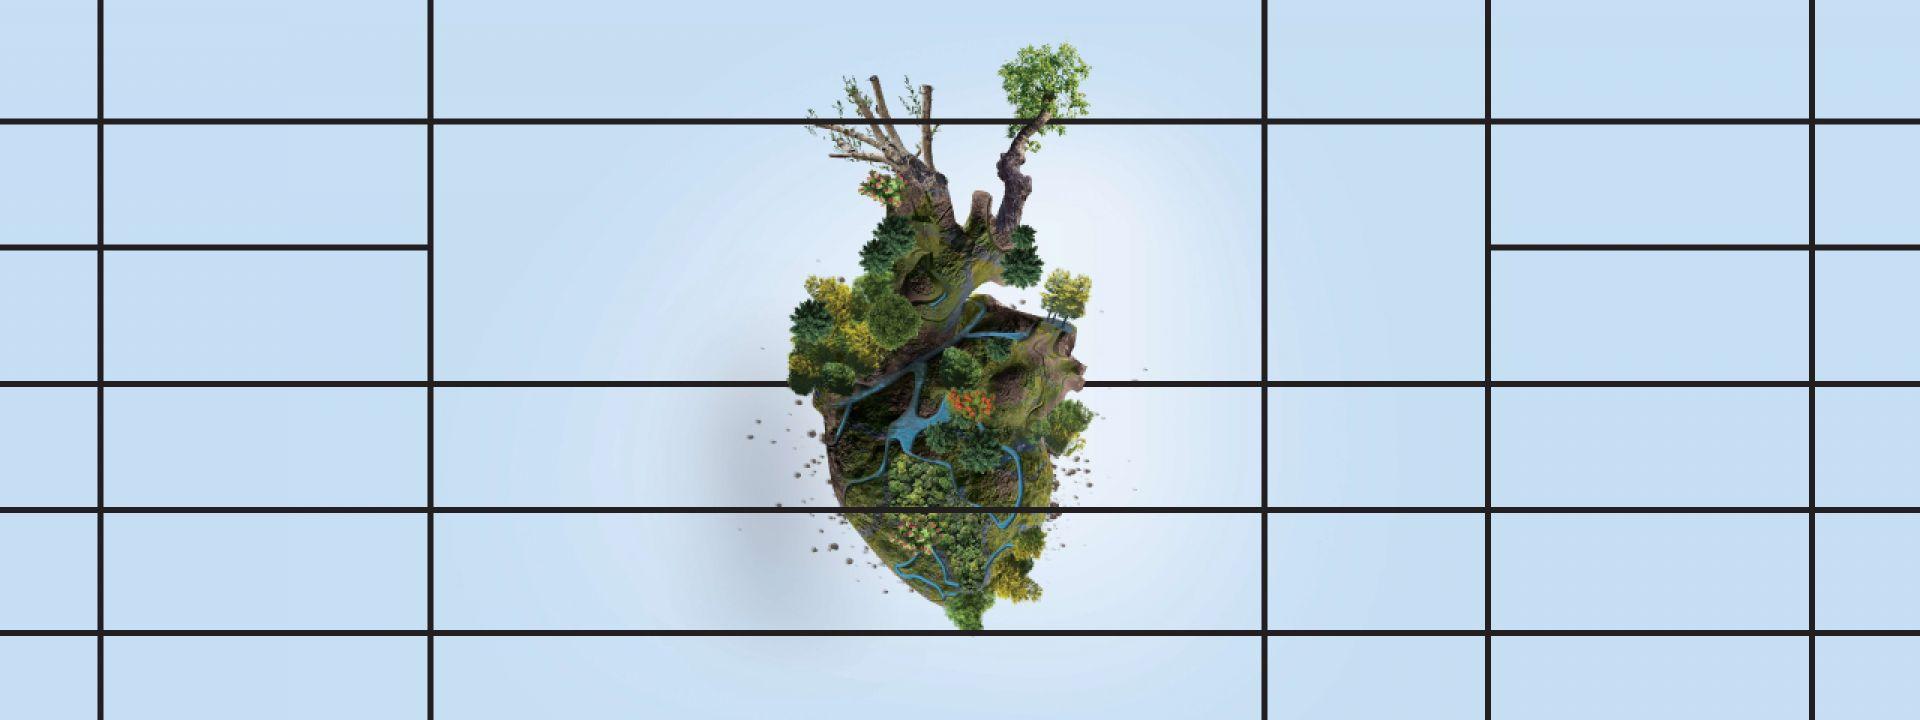 Eυρωπαϊκή Ημέρα Natura 2000: Γιορτάζουμε την προστασία της ελληνικής φύσης - Εικόνα